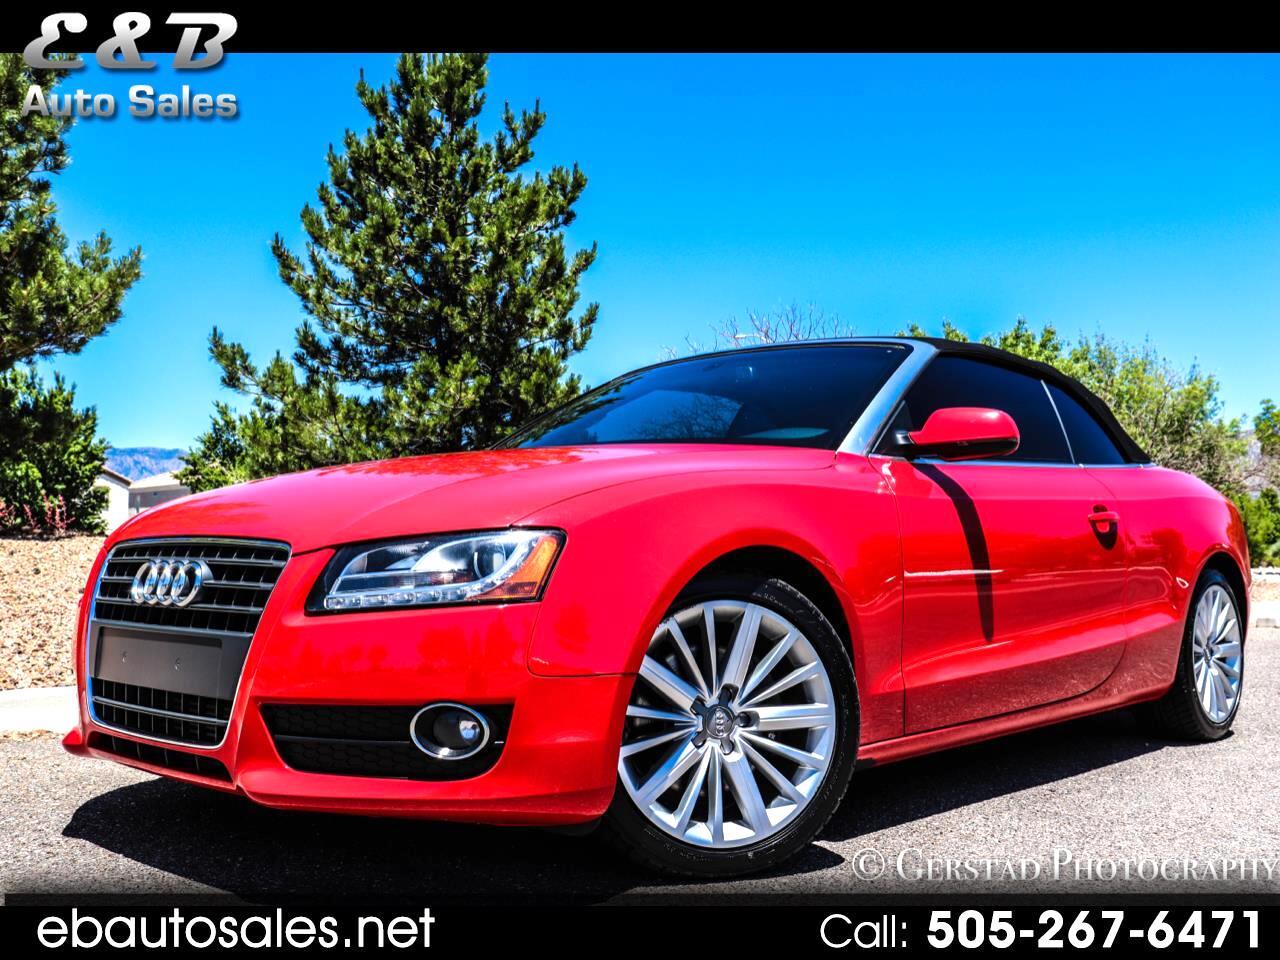 Audi A5 Cabriolet 2.0T FrontTrak Multitronic 2011